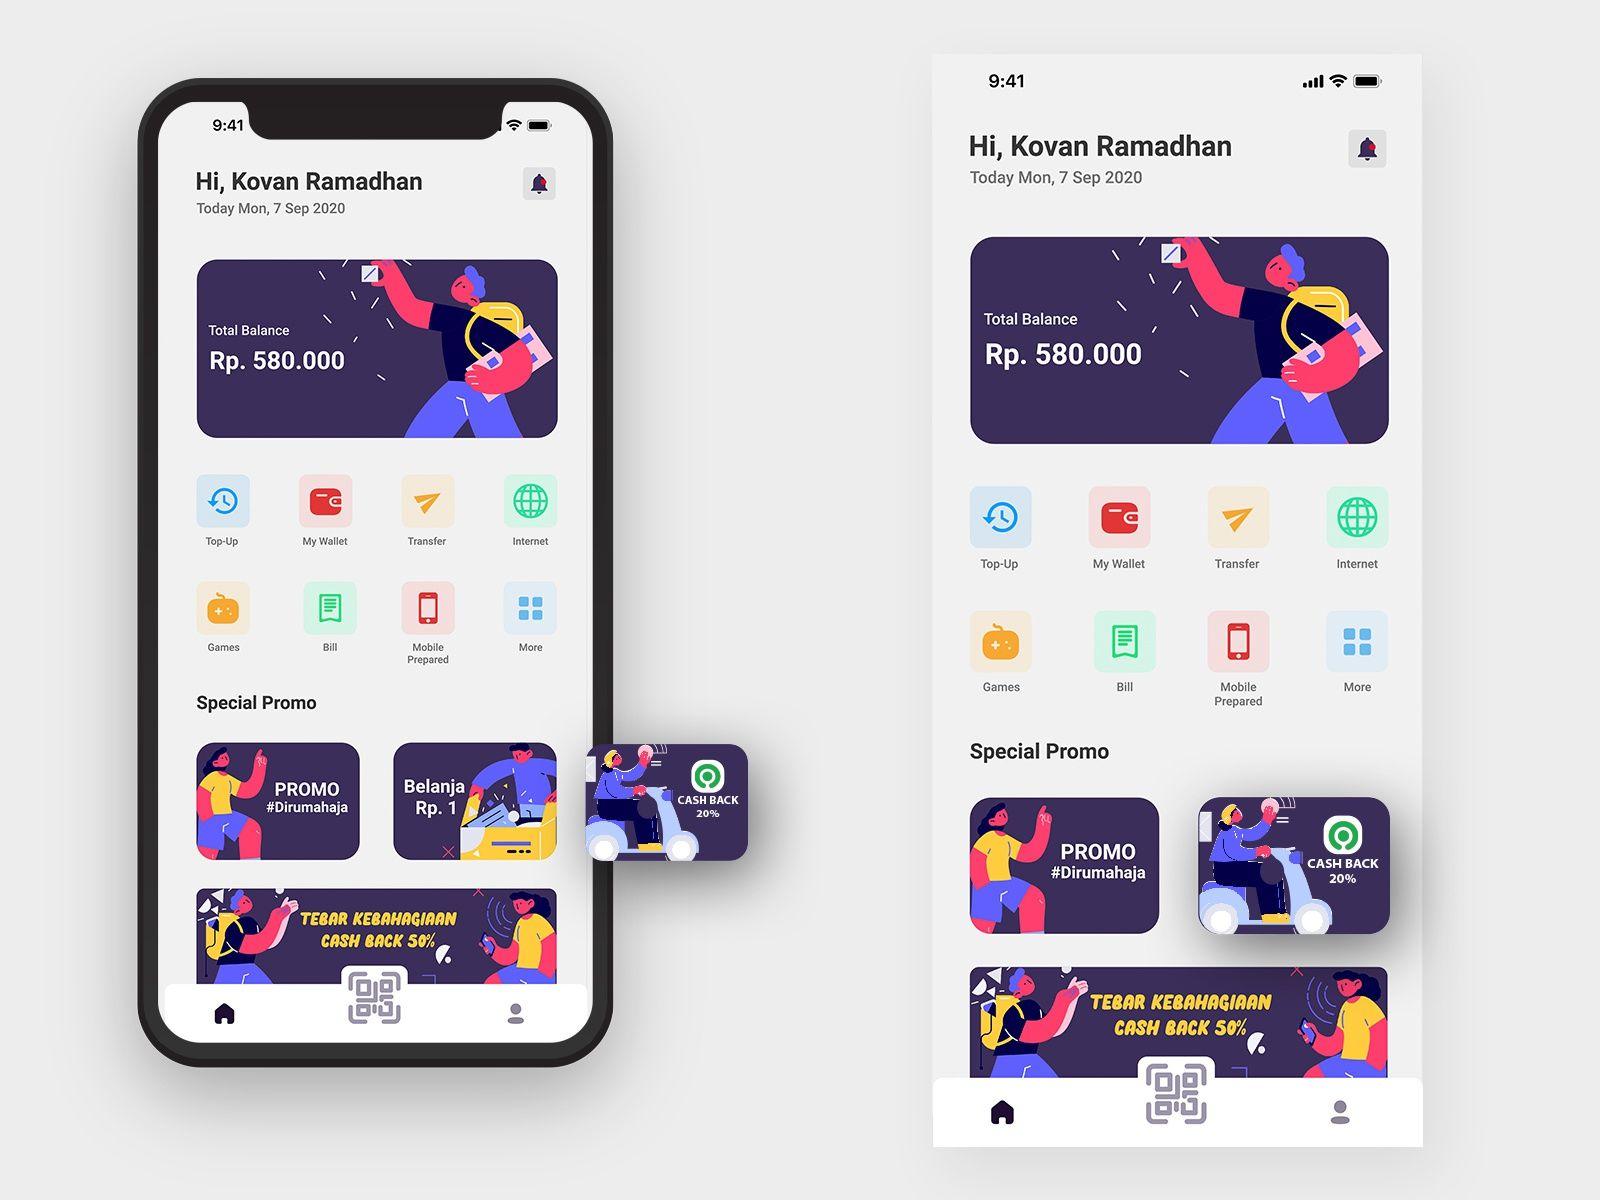 EWallet App in 2020 App, App design, Digital wallet